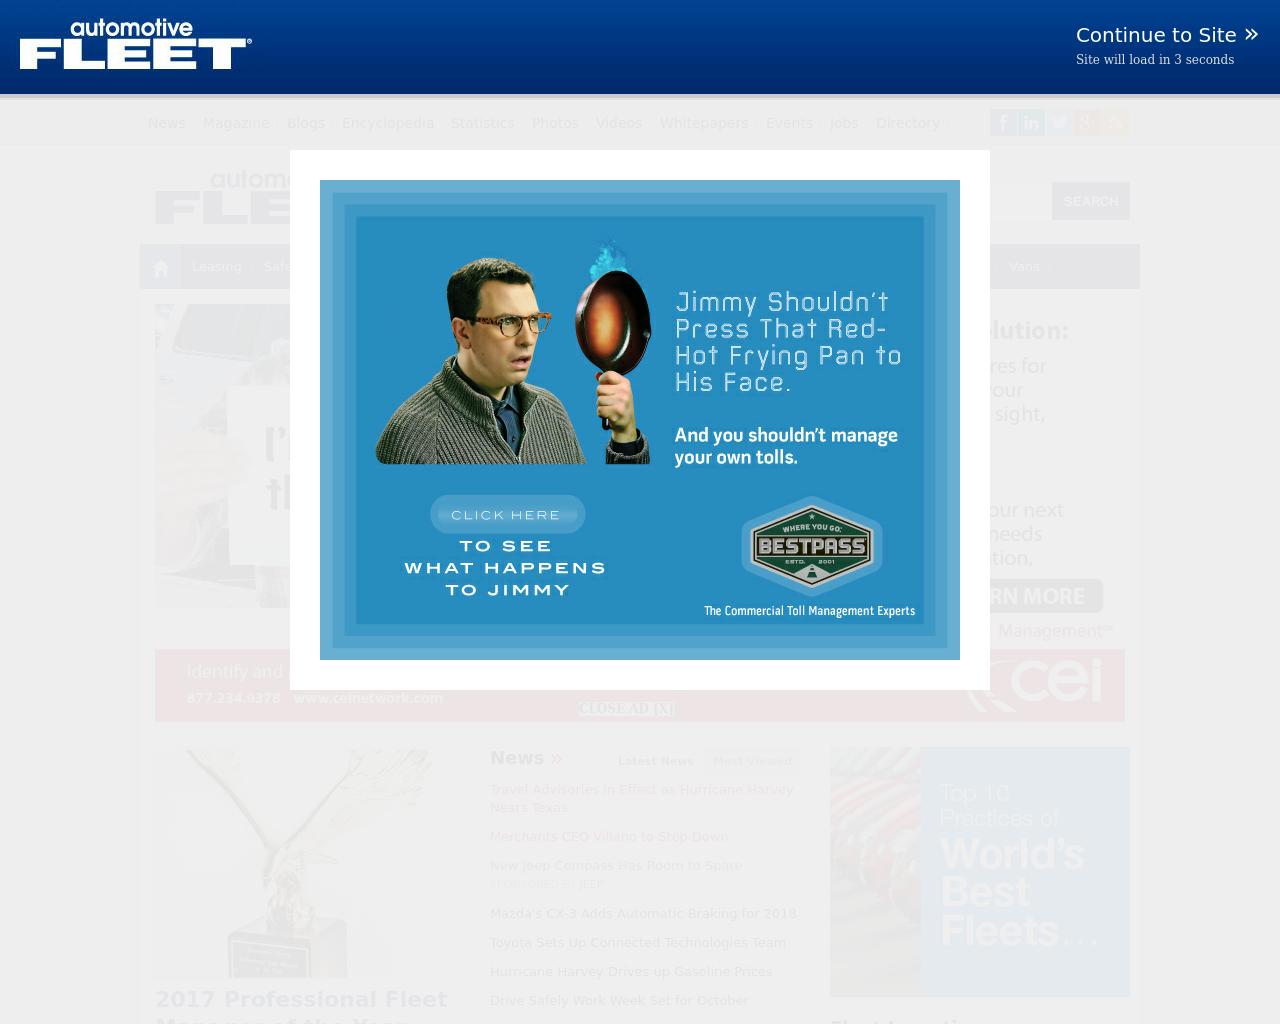 Automotive-Fleet-Advertising-Reviews-Pricing